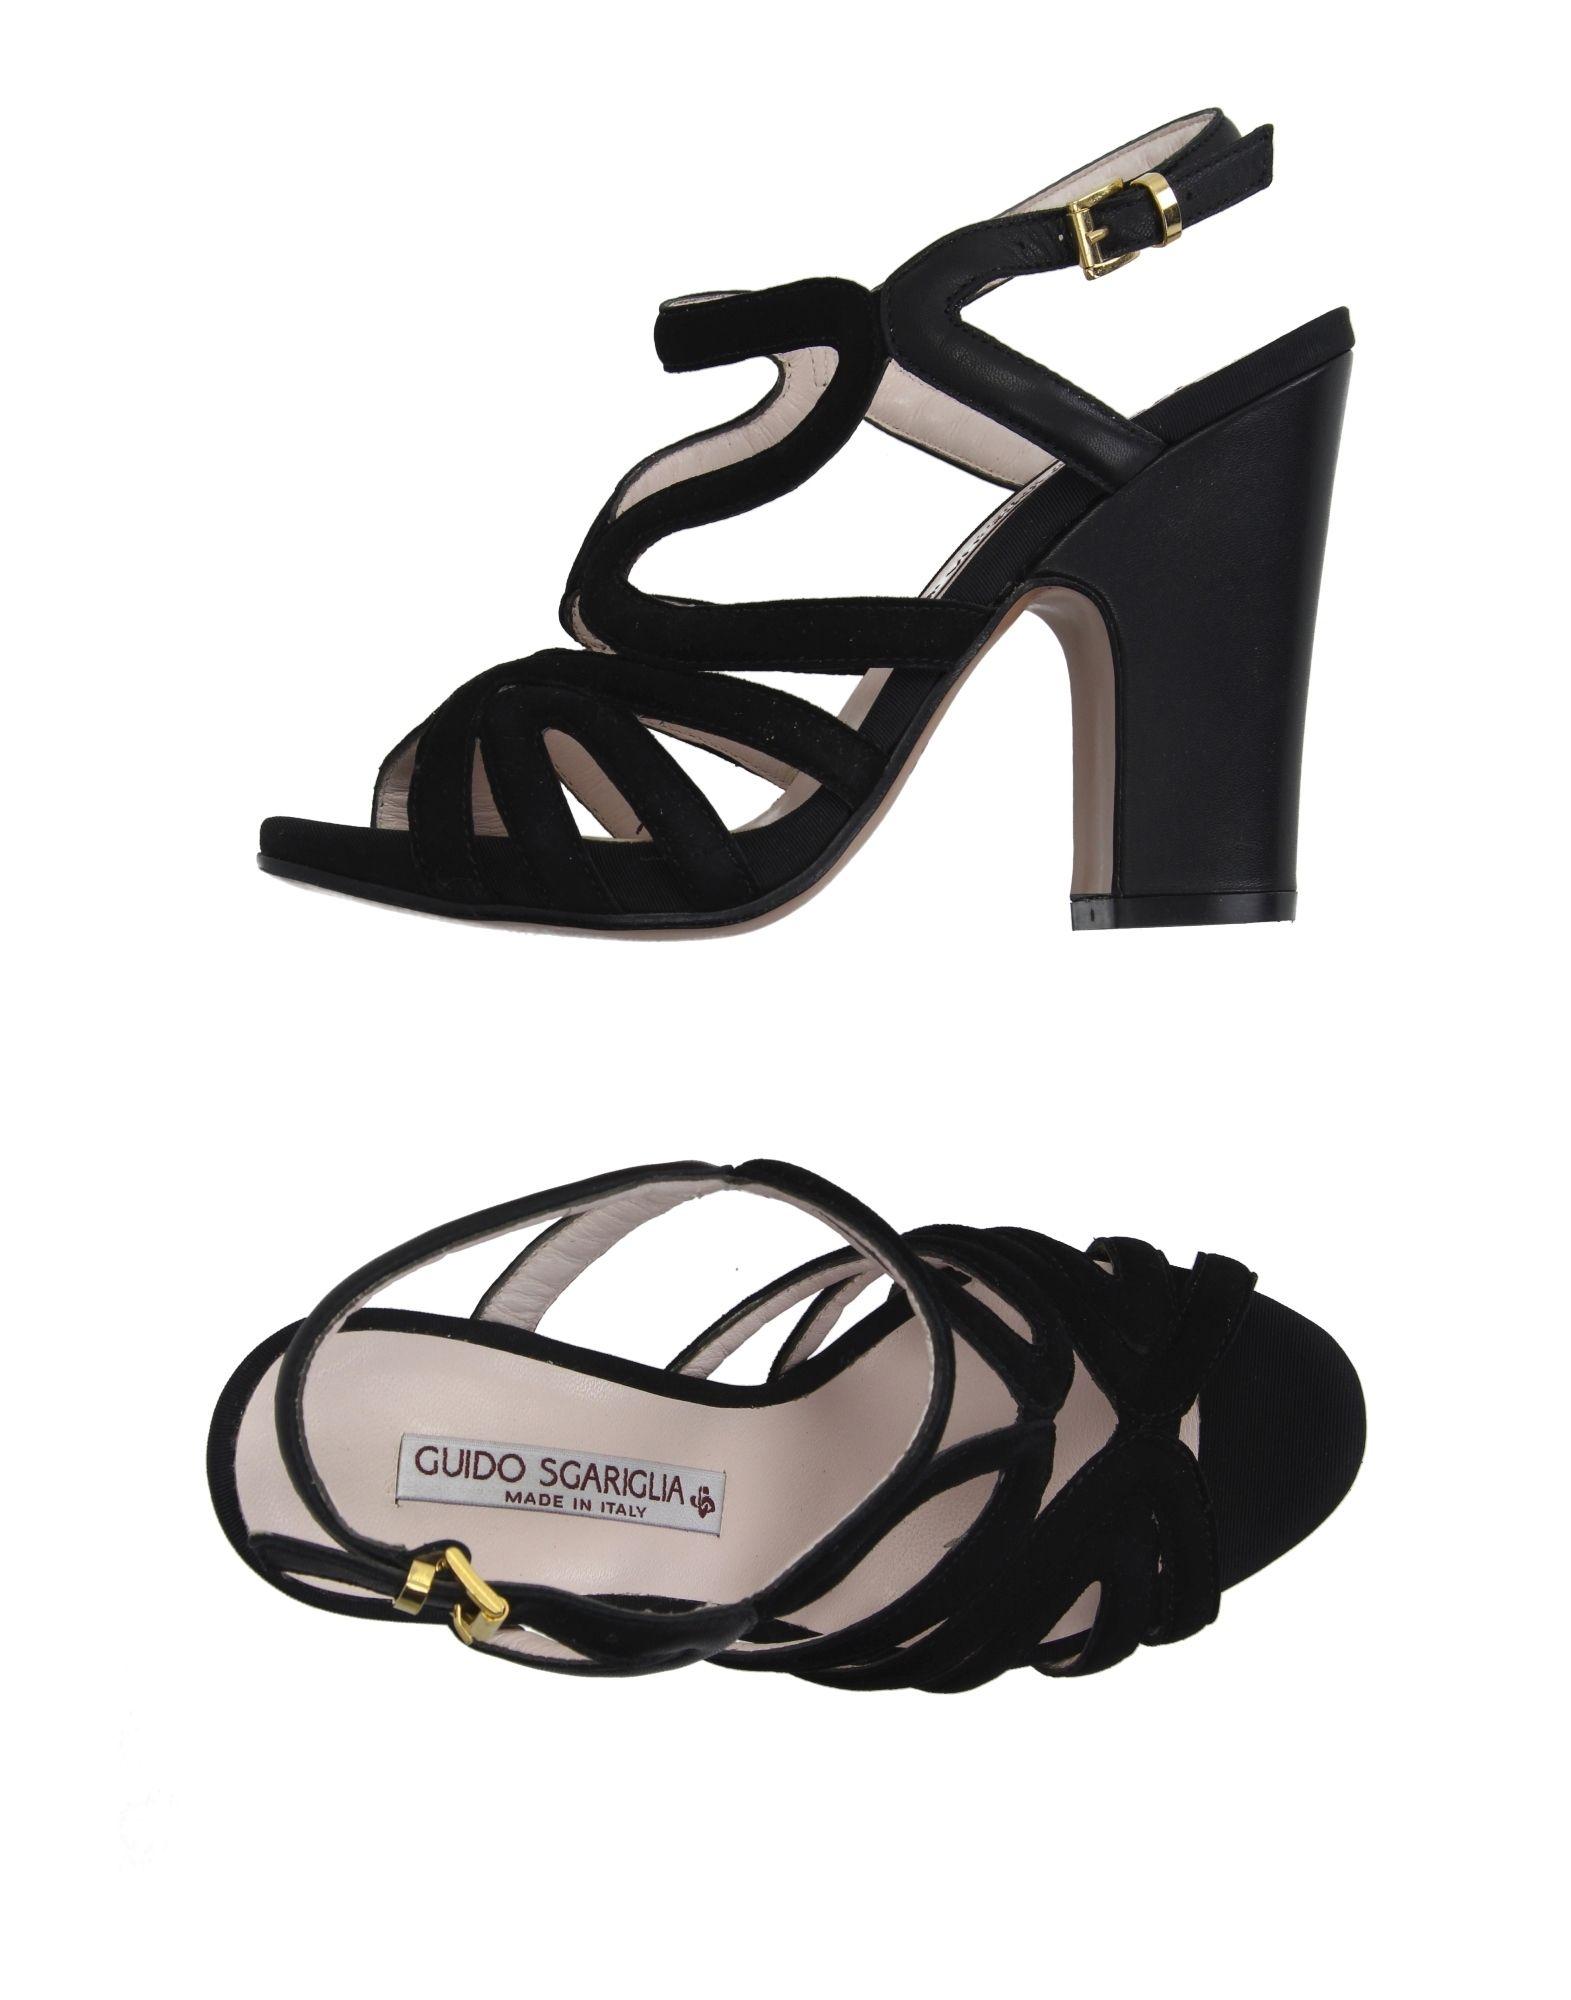 Guido Sgariglia Sgariglia Sandals - Women Guido Sgariglia Sgariglia Sandals online on  United Kingdom - 44994227IQ 6da013